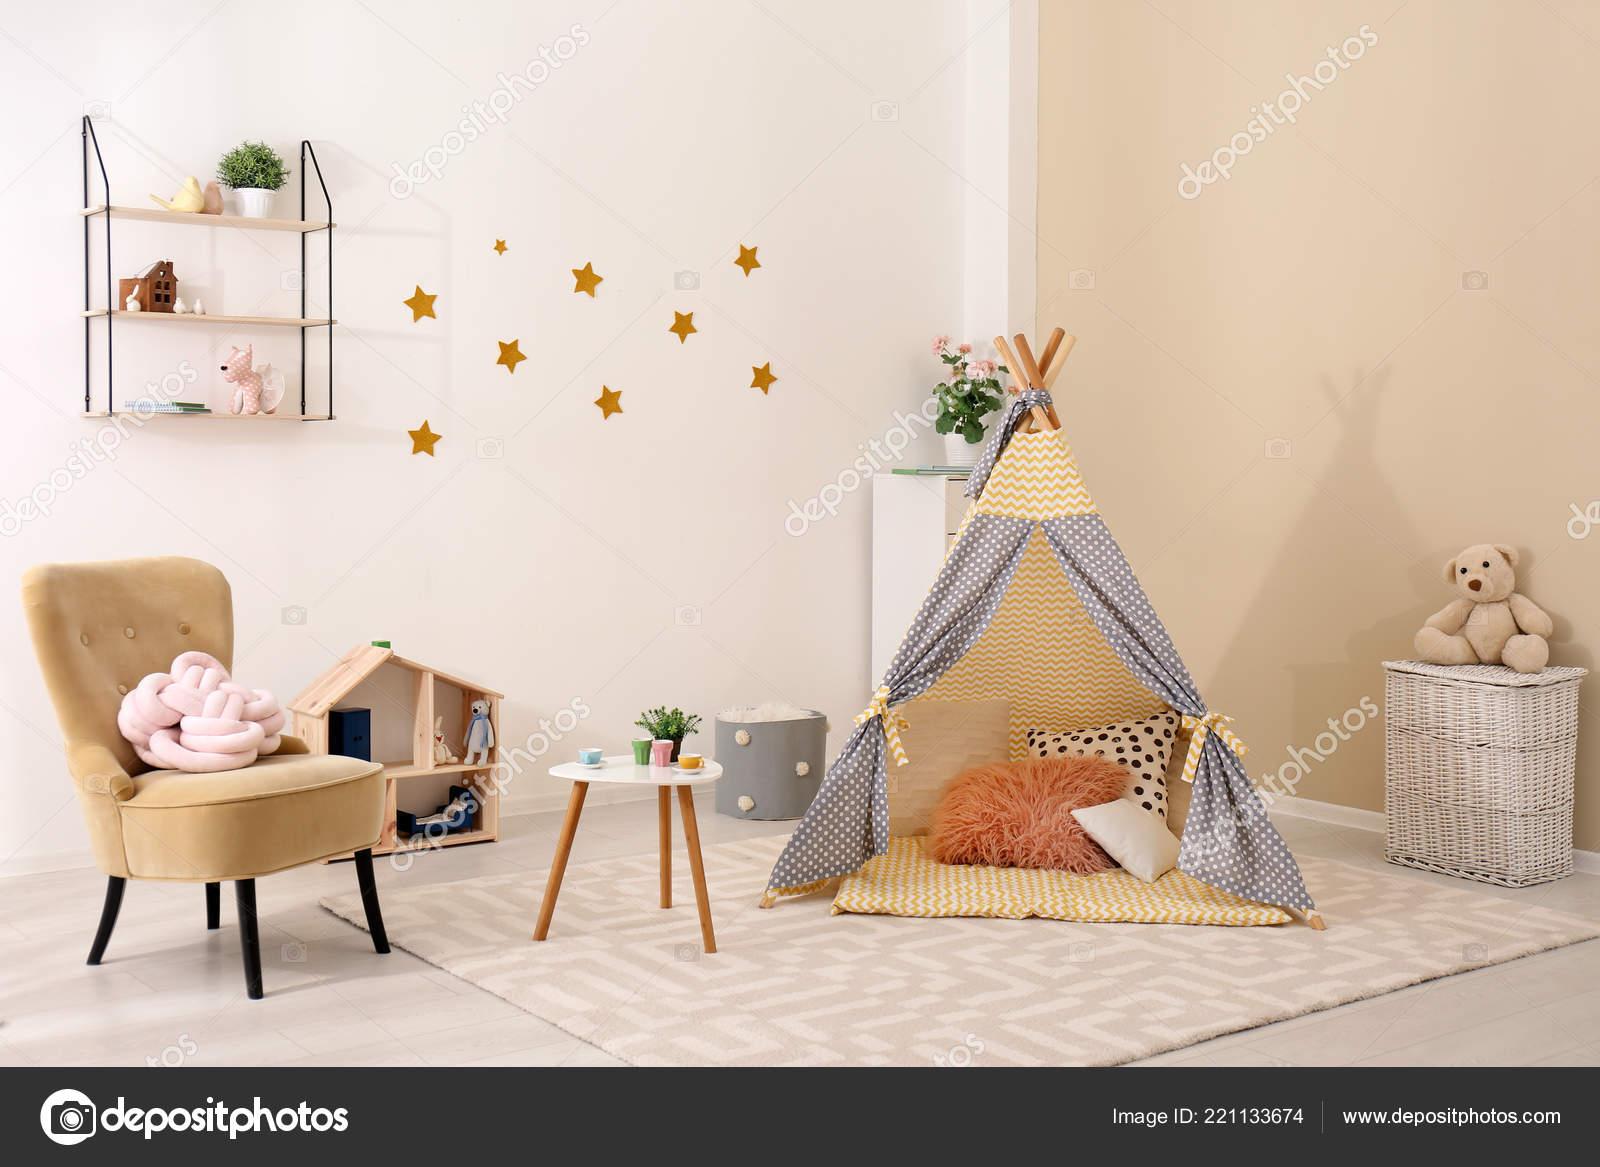 Cozy Kids Room Interior Play Tent Toys u2014 Stock Photo & Cozy Kids Room Interior Play Tent Toys u2014 Stock Photo ...